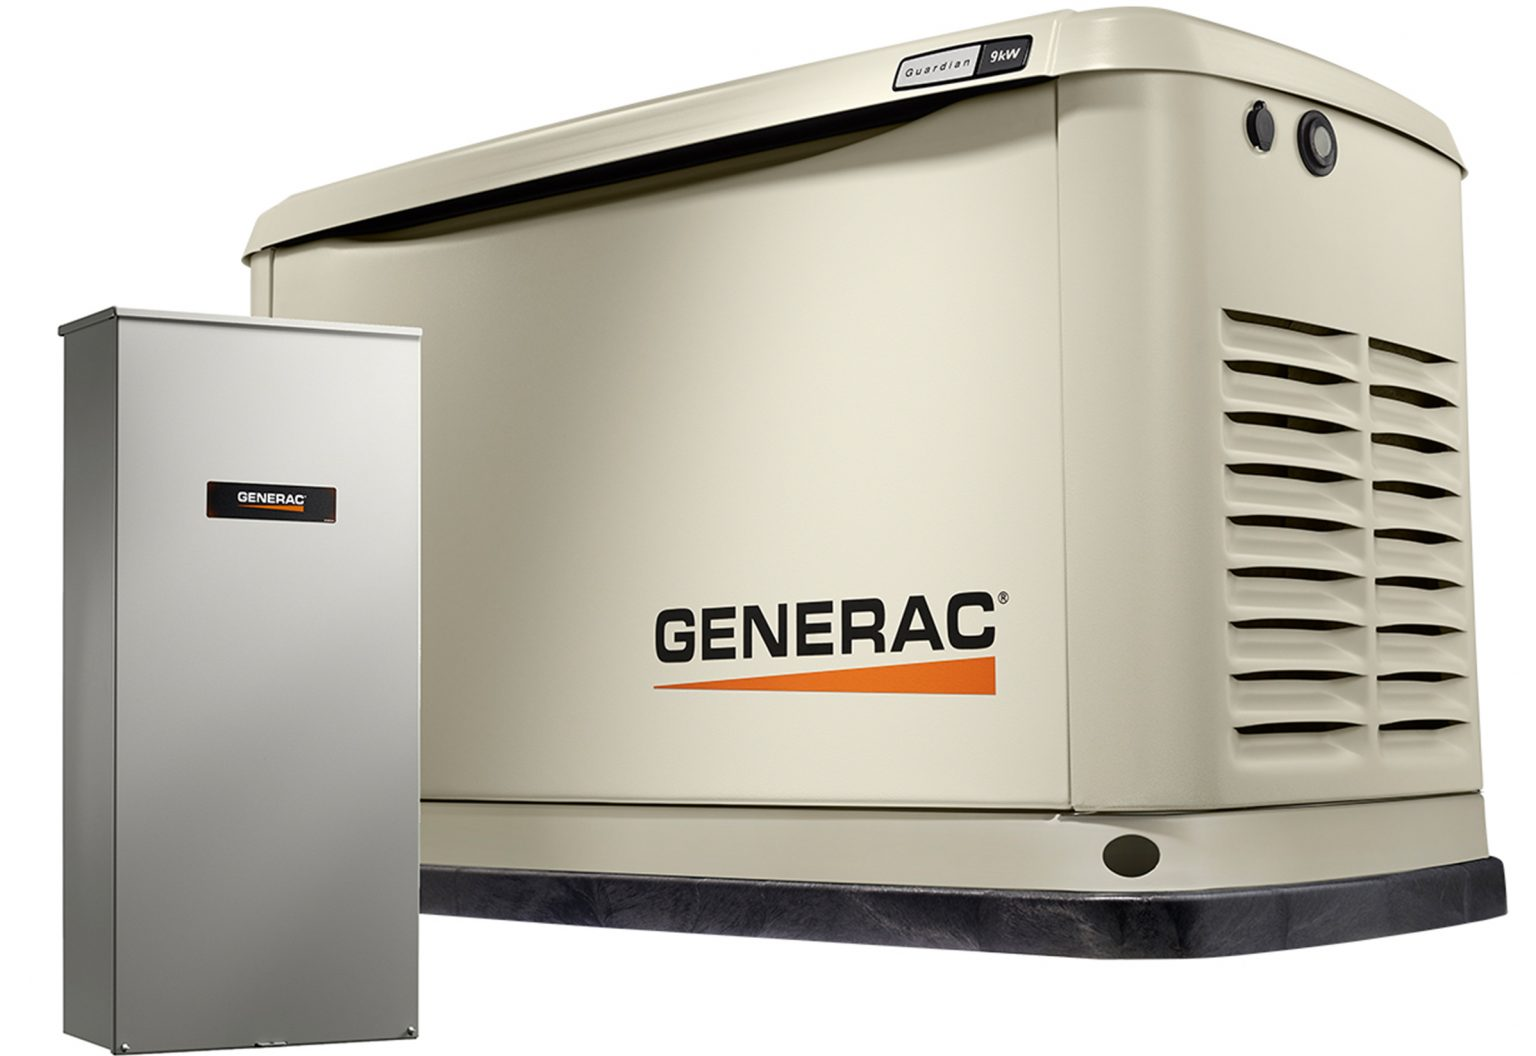 generac generators Appco Power Solutions Myrtle Beach